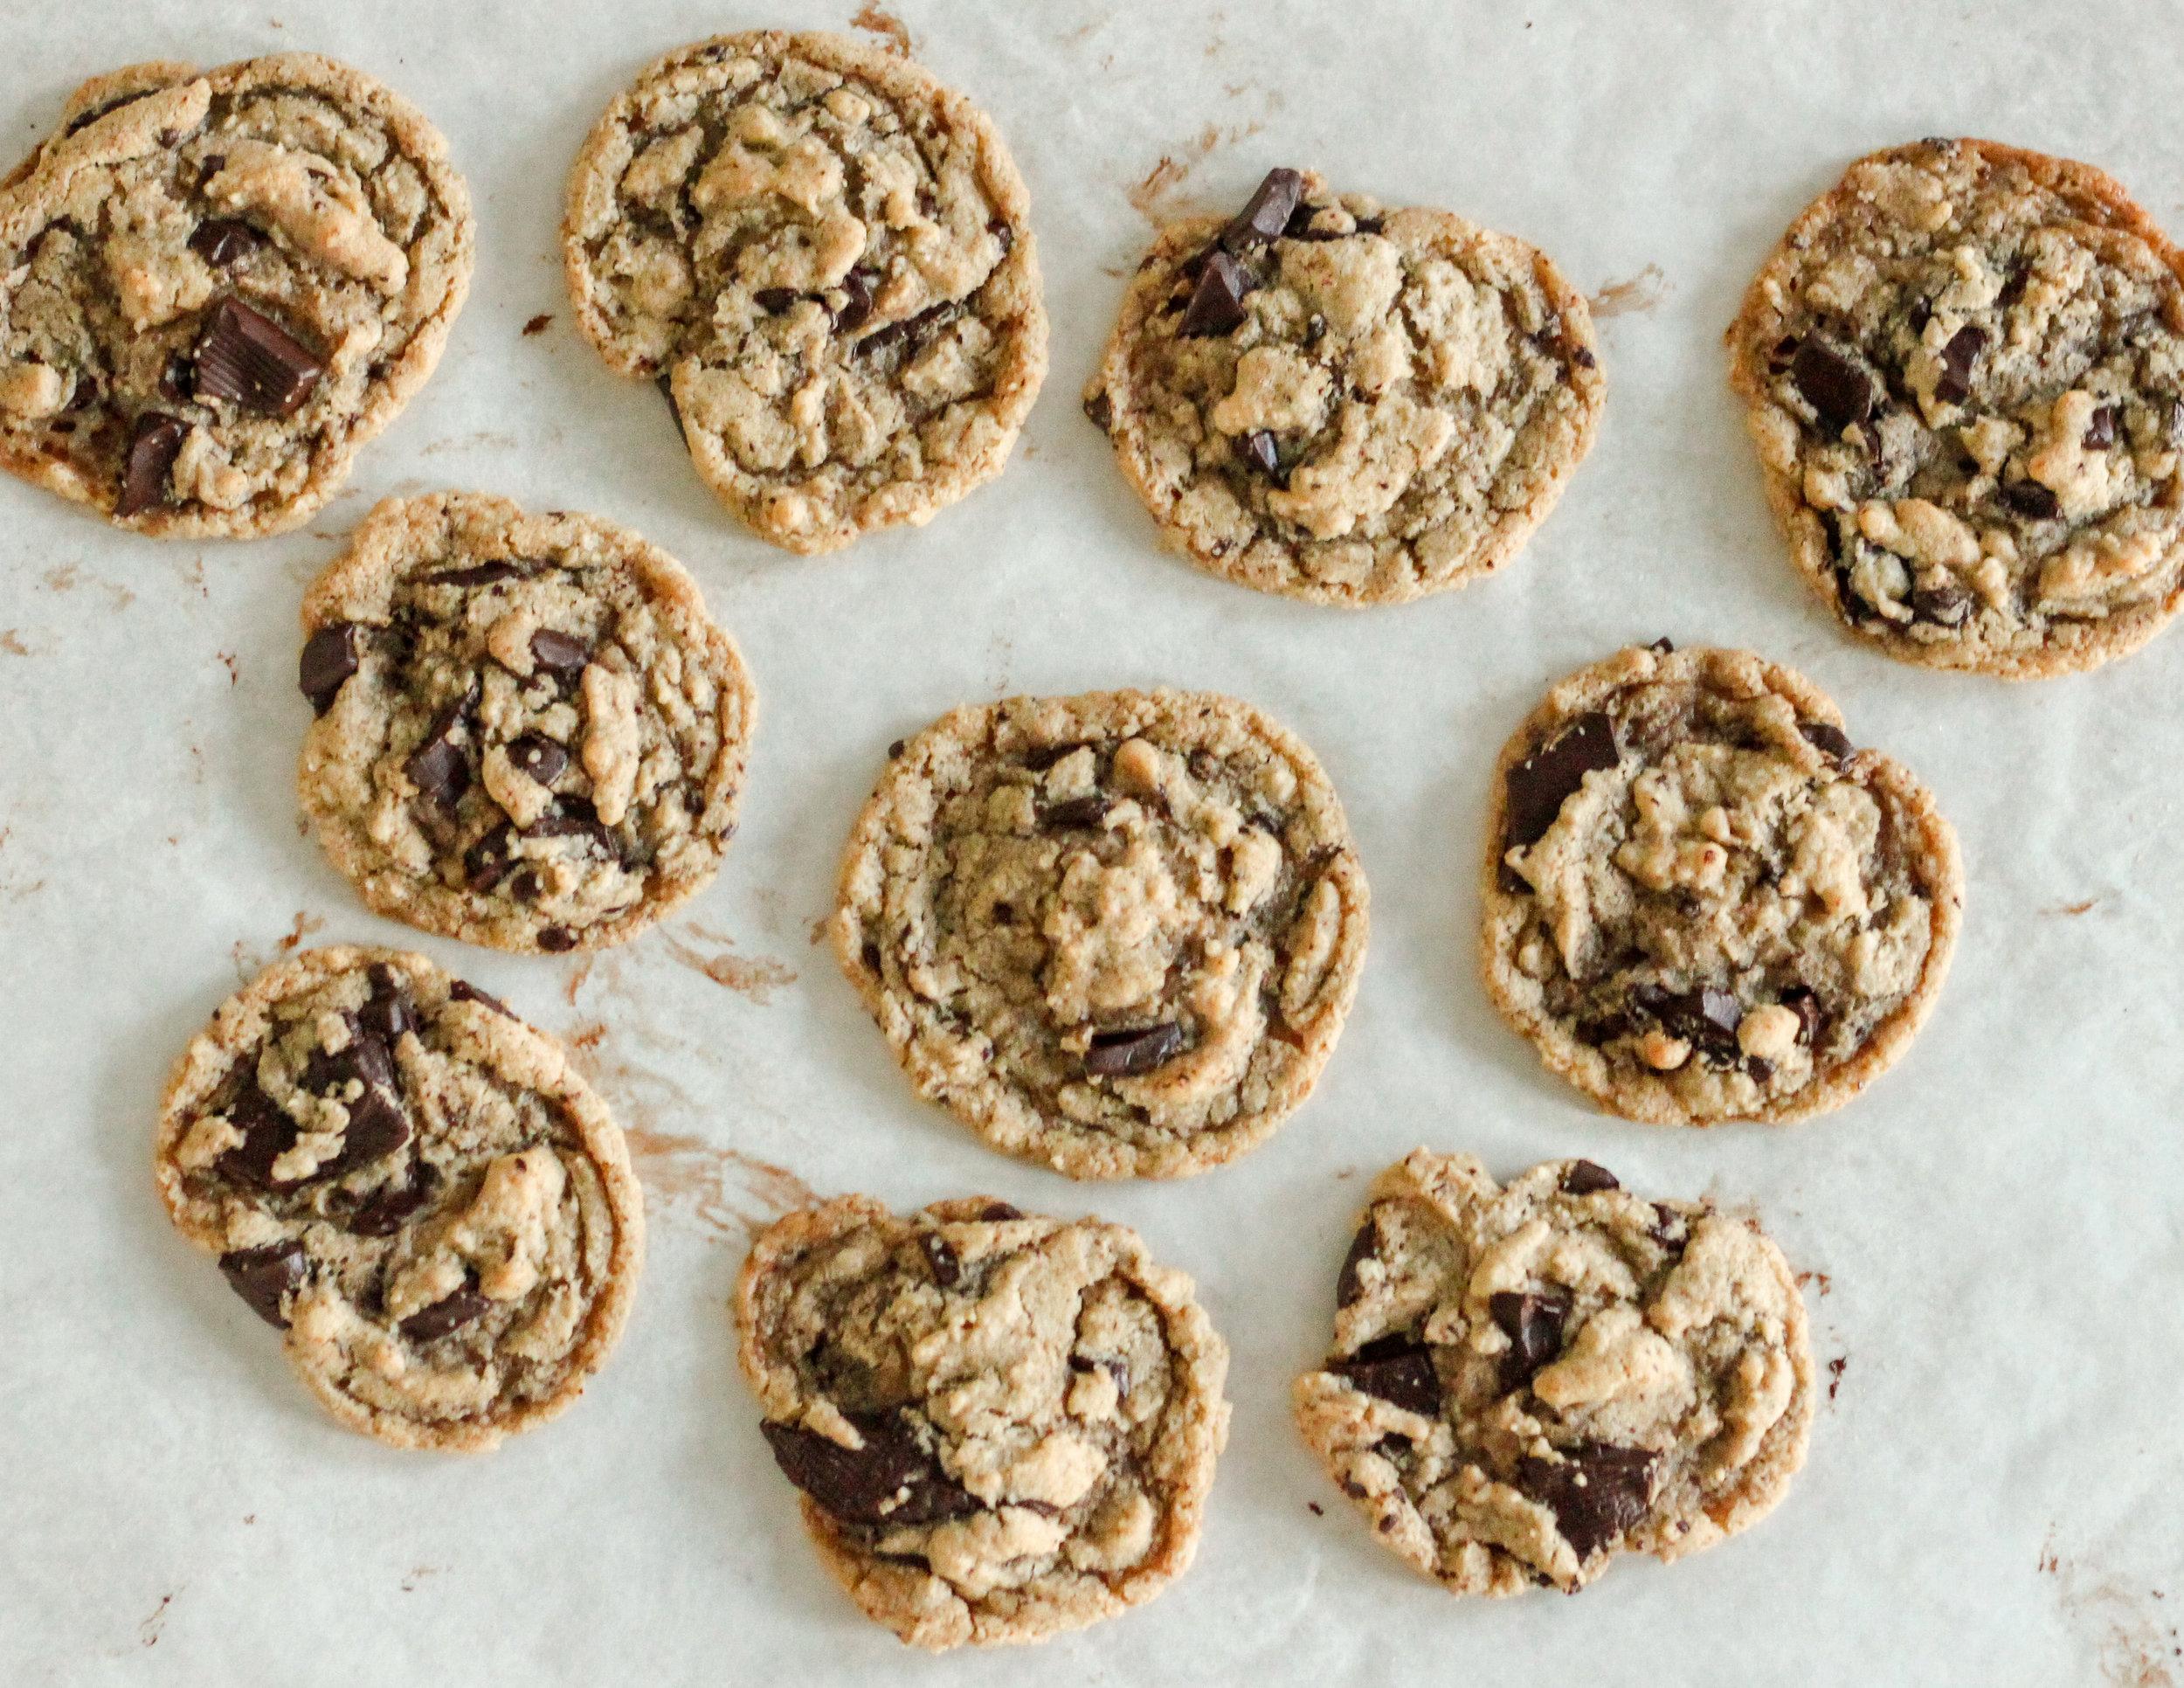 V/GF Chocolate Chunk Cookies